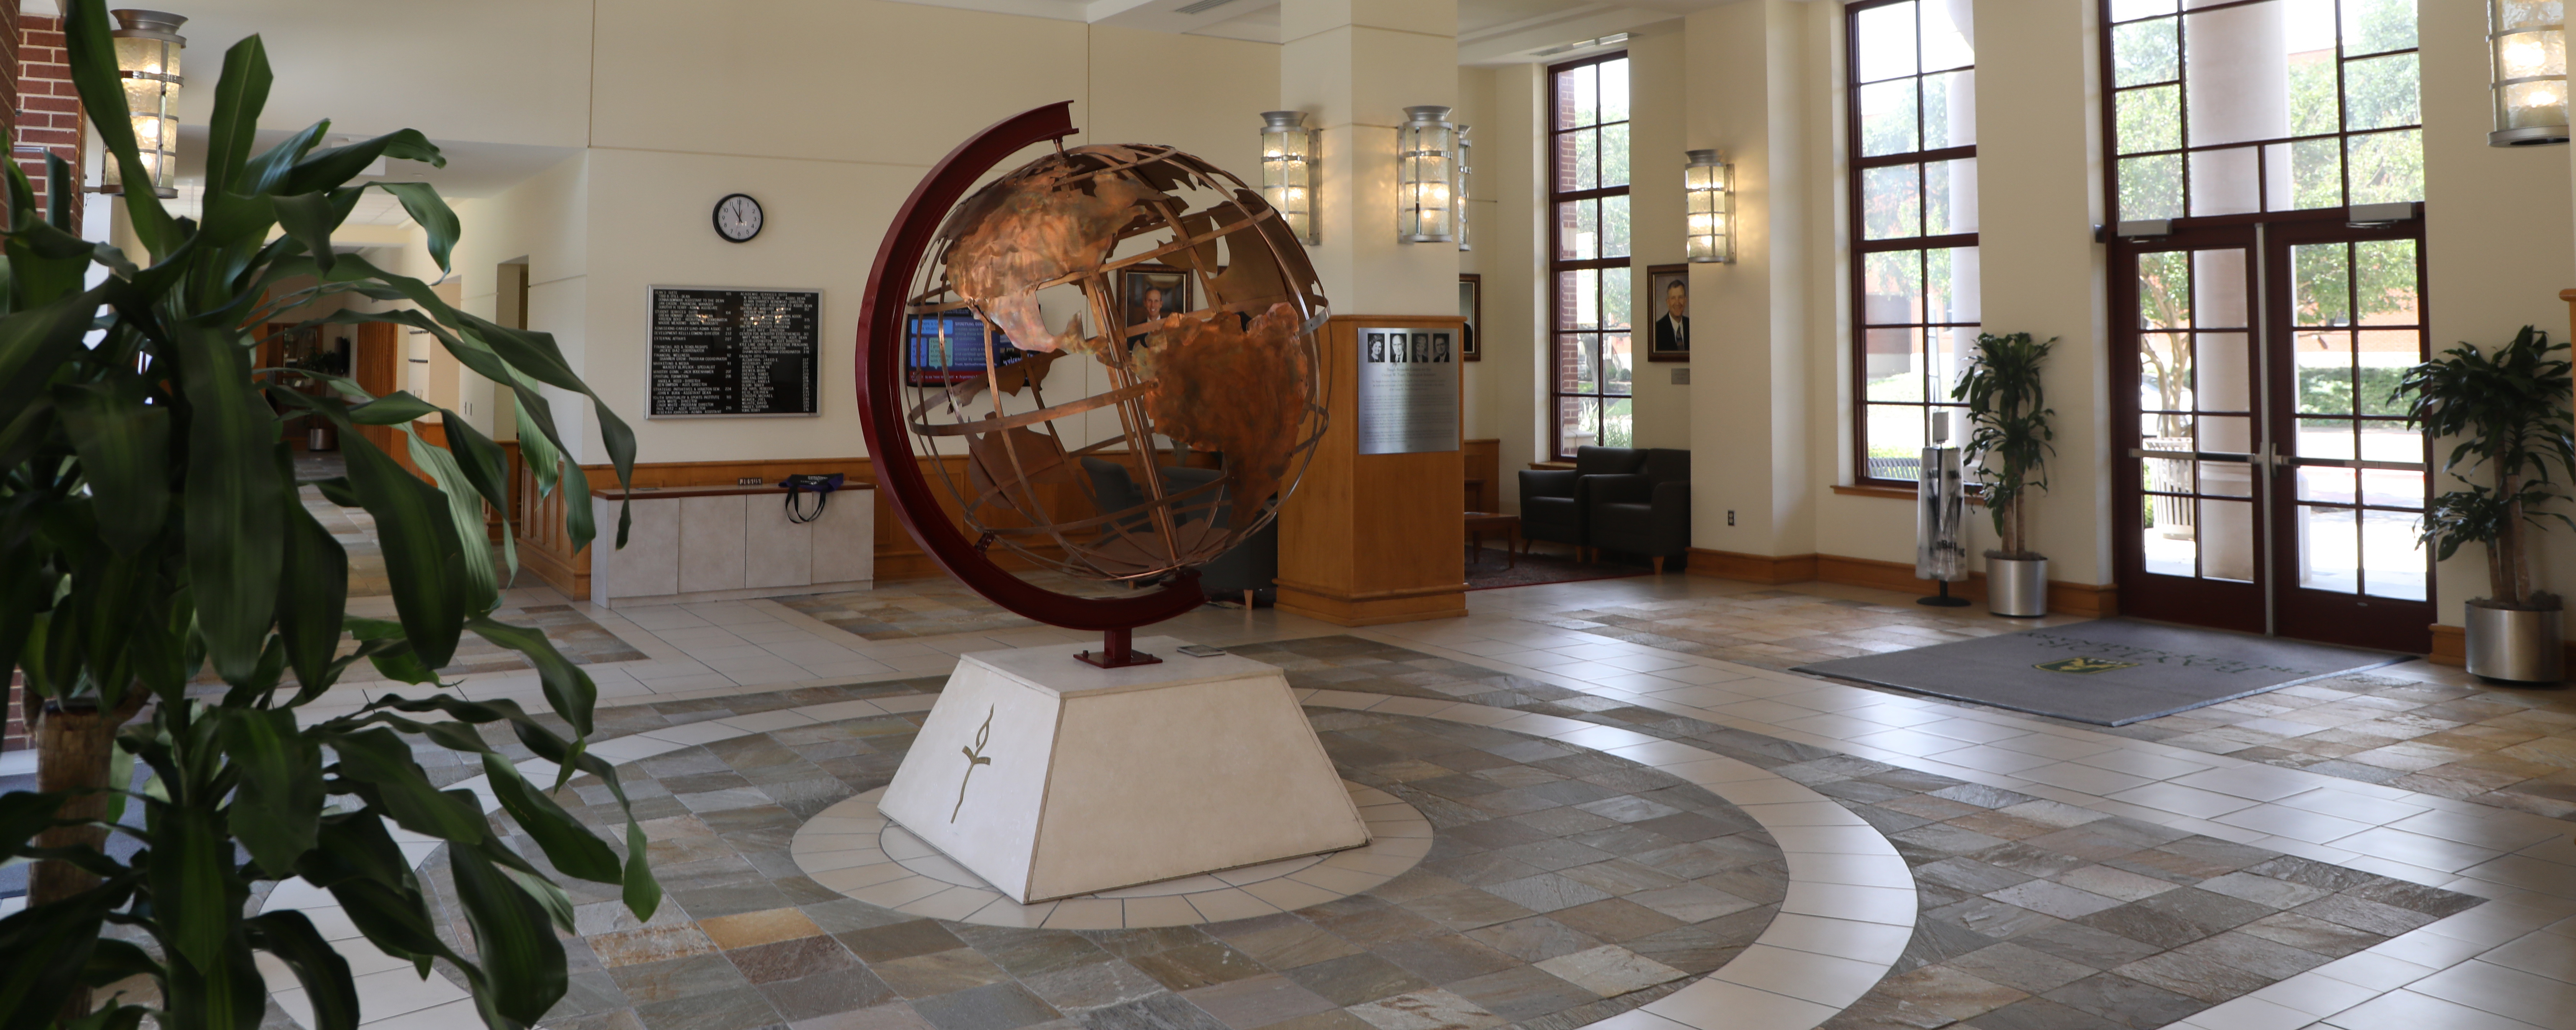 Truett Globe